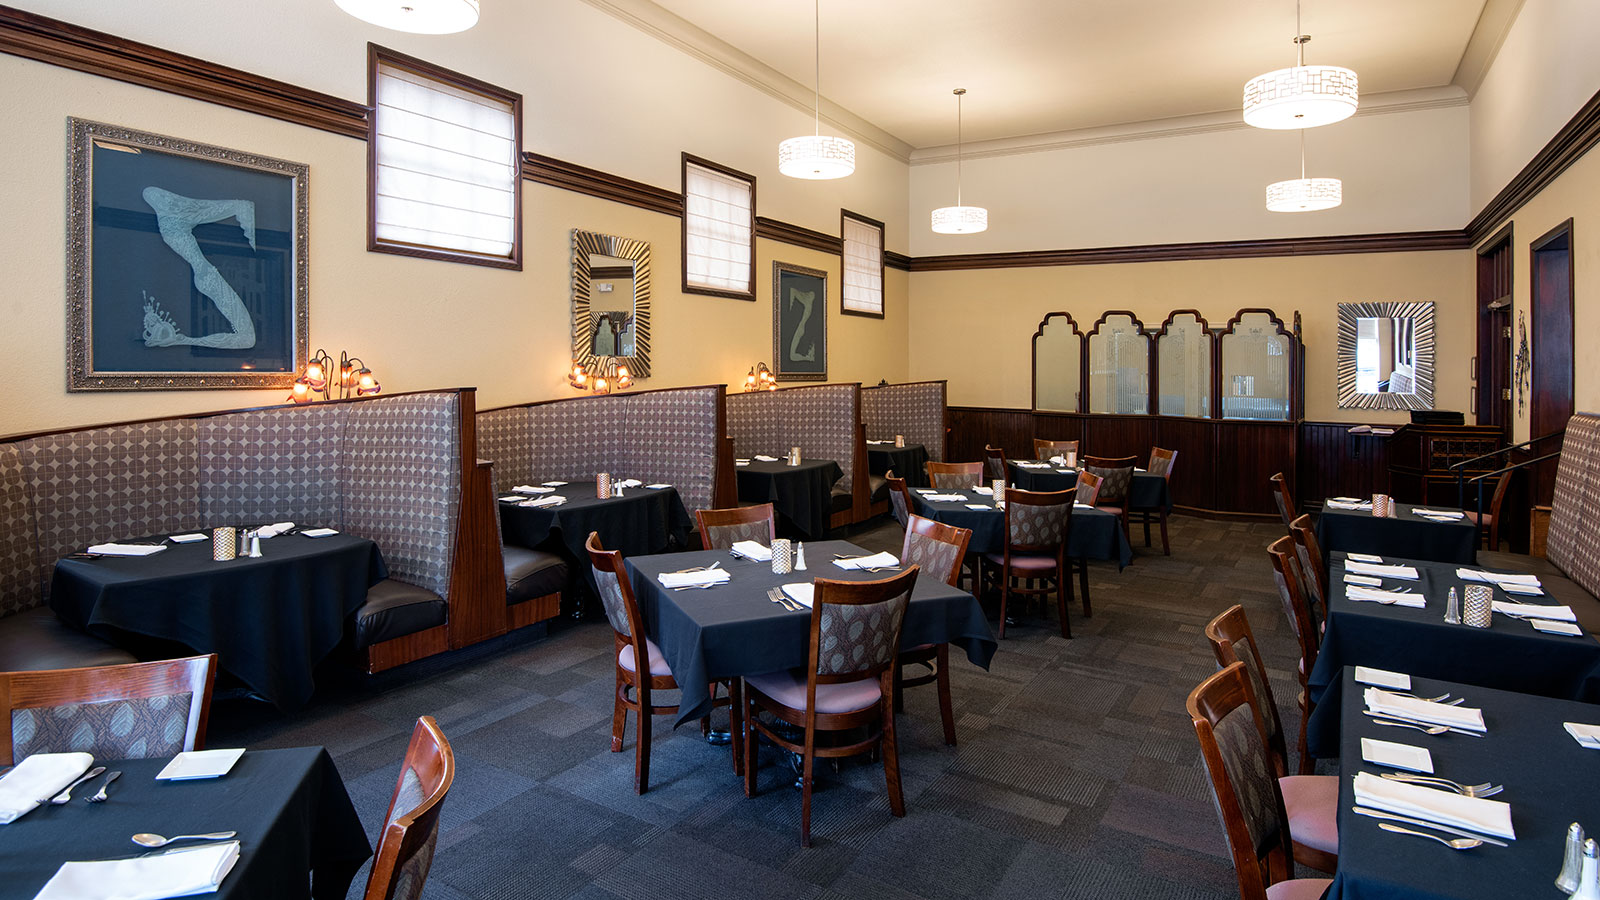 Image of Peacock Dining Room Hassayampa Inn in Prescott, Arizona